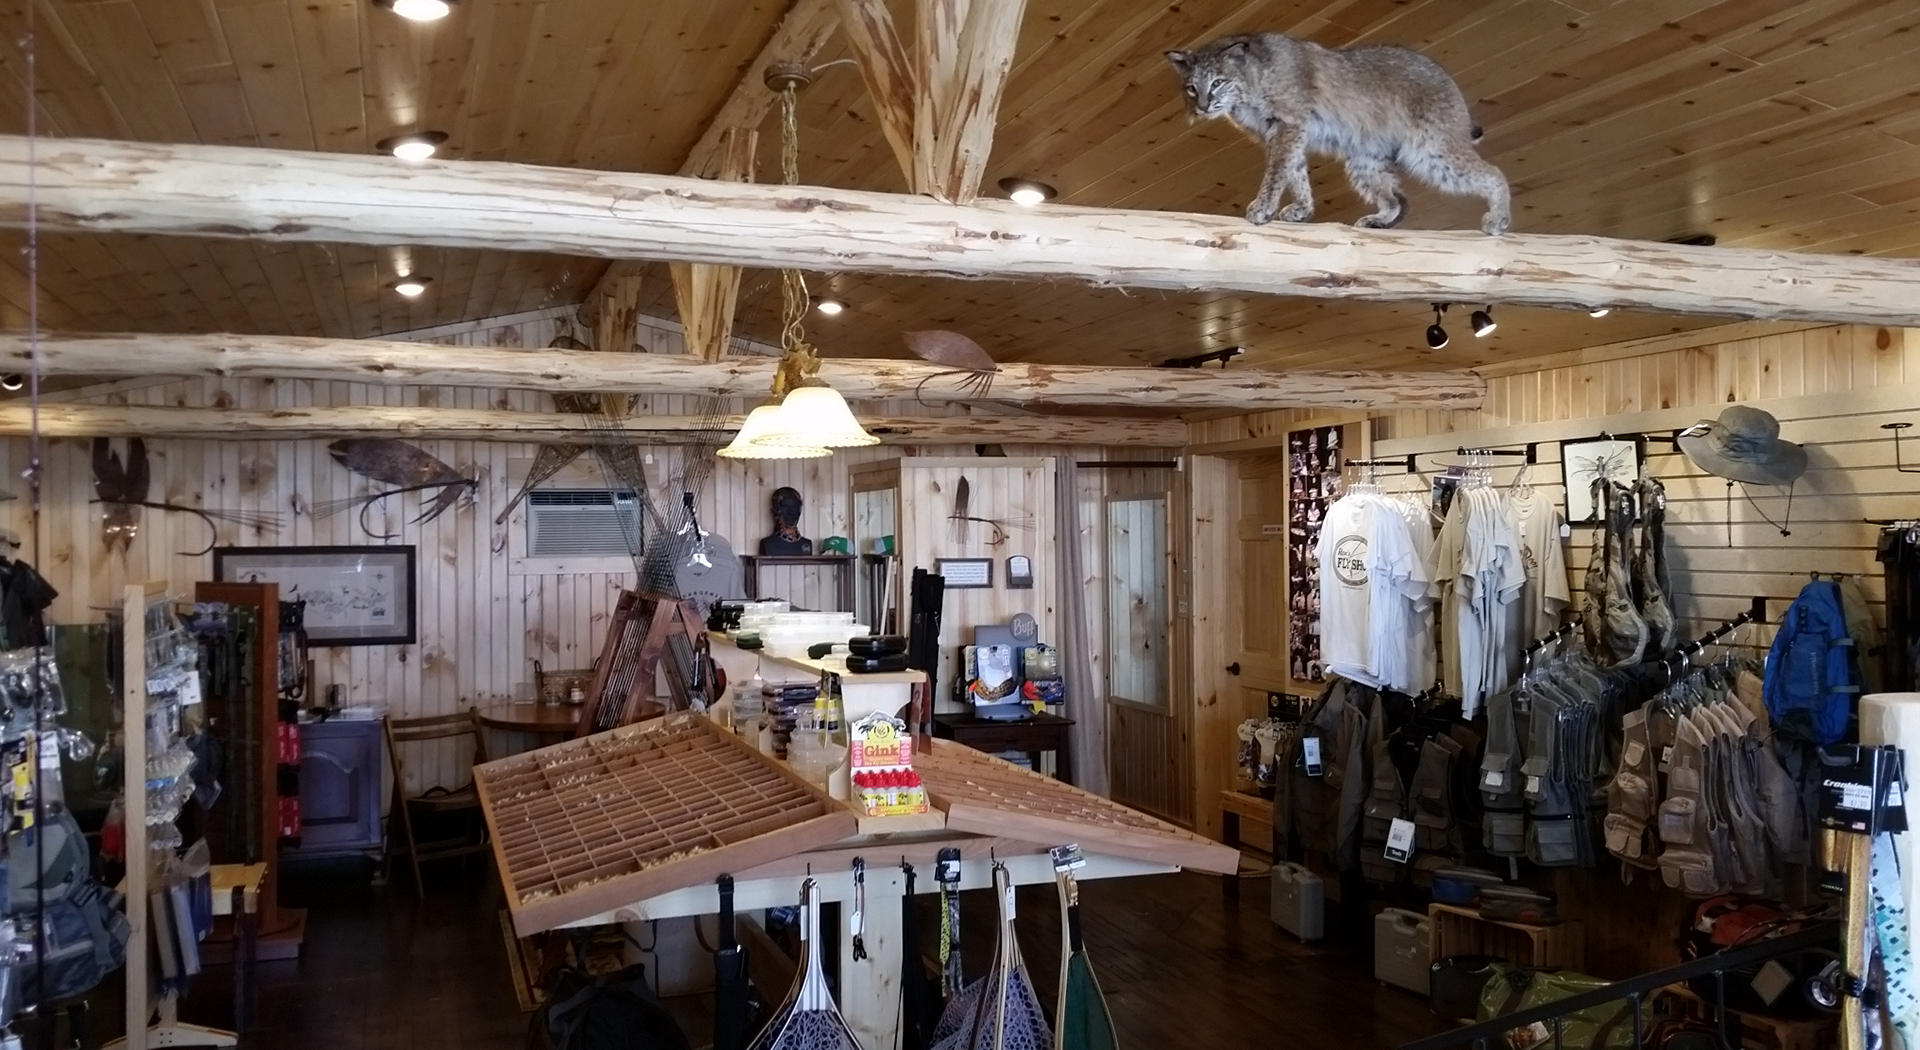 Ron's Fly Shop Interior